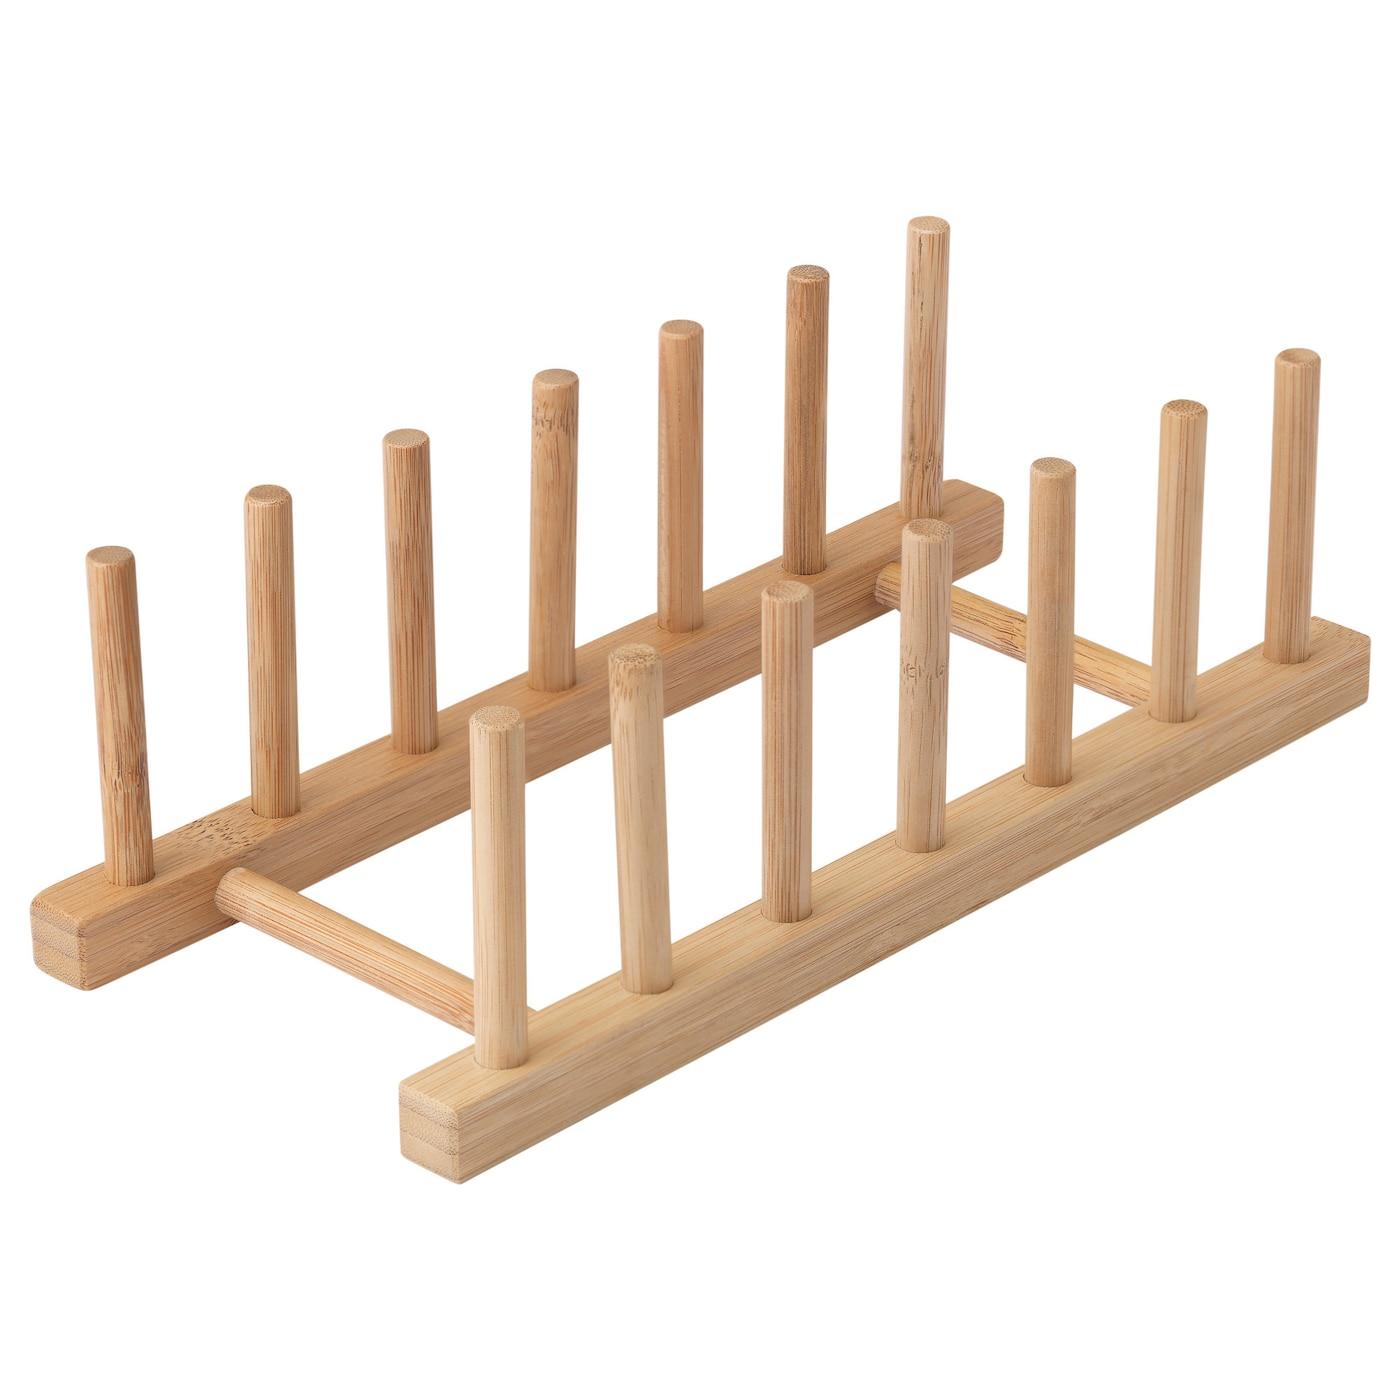 ostbit range-assiettes bambou - ikea